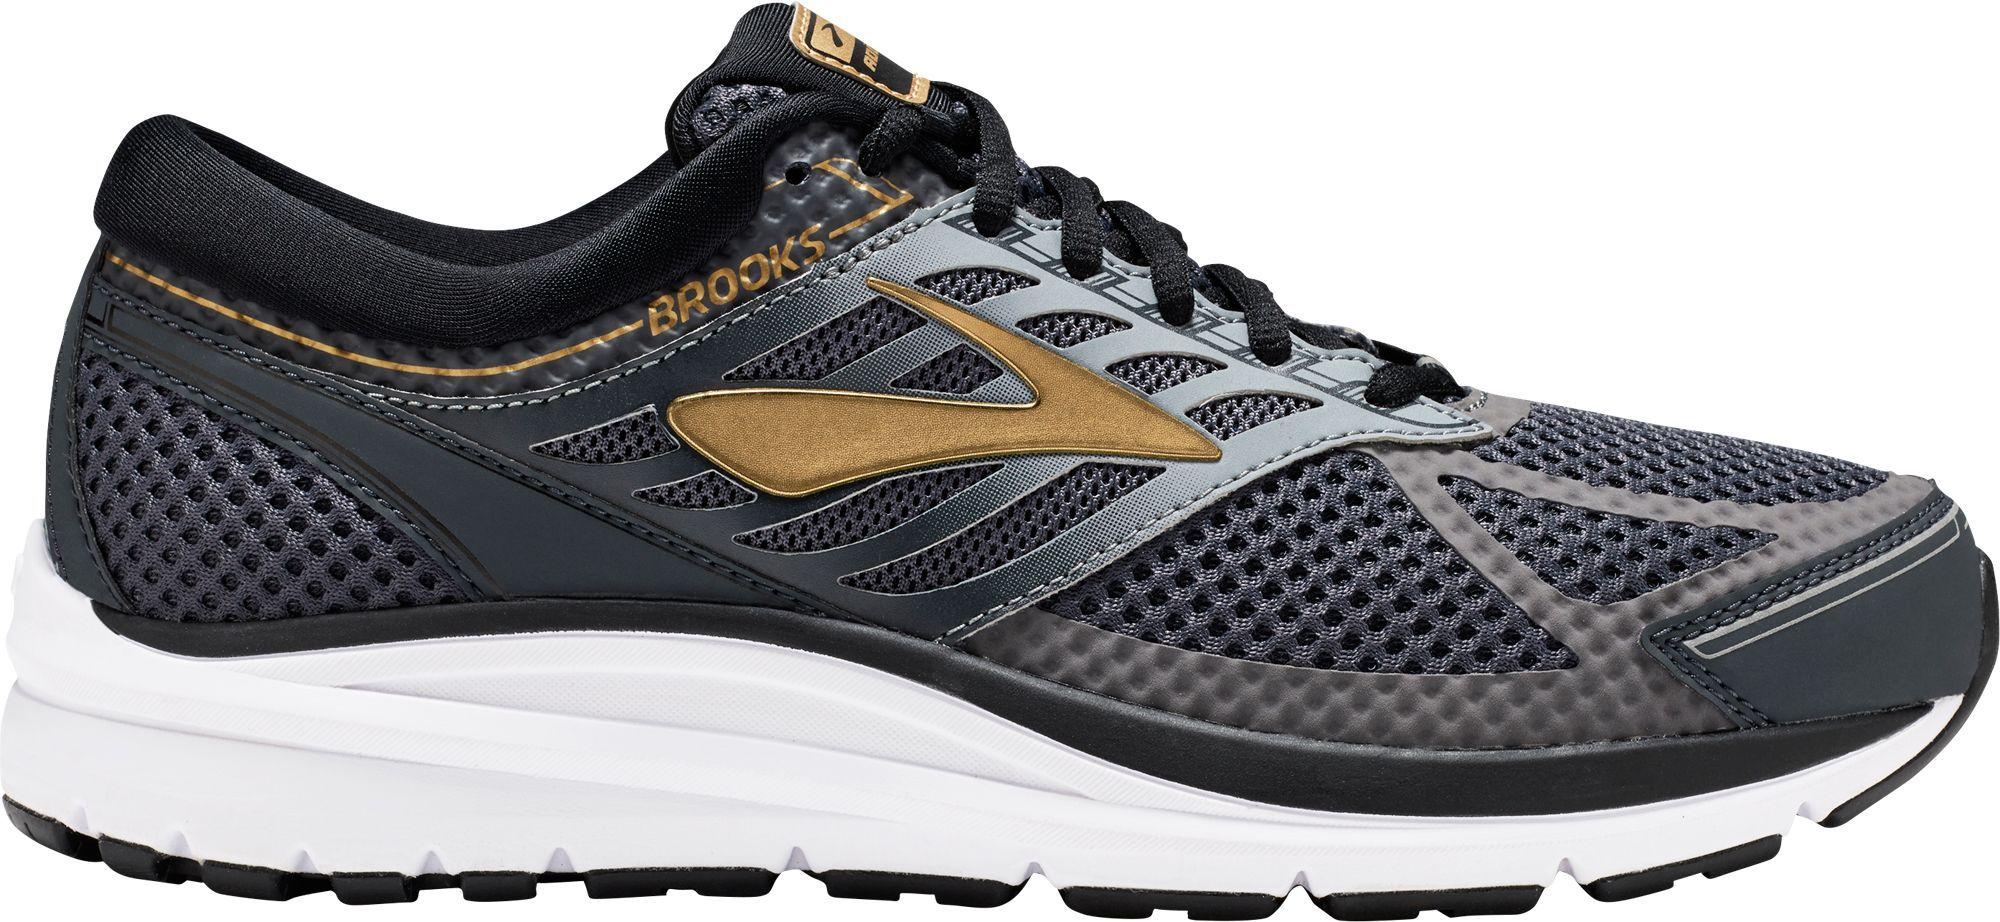 8273d9b09ee Brooks Men s Addiction 13 Running Shoes